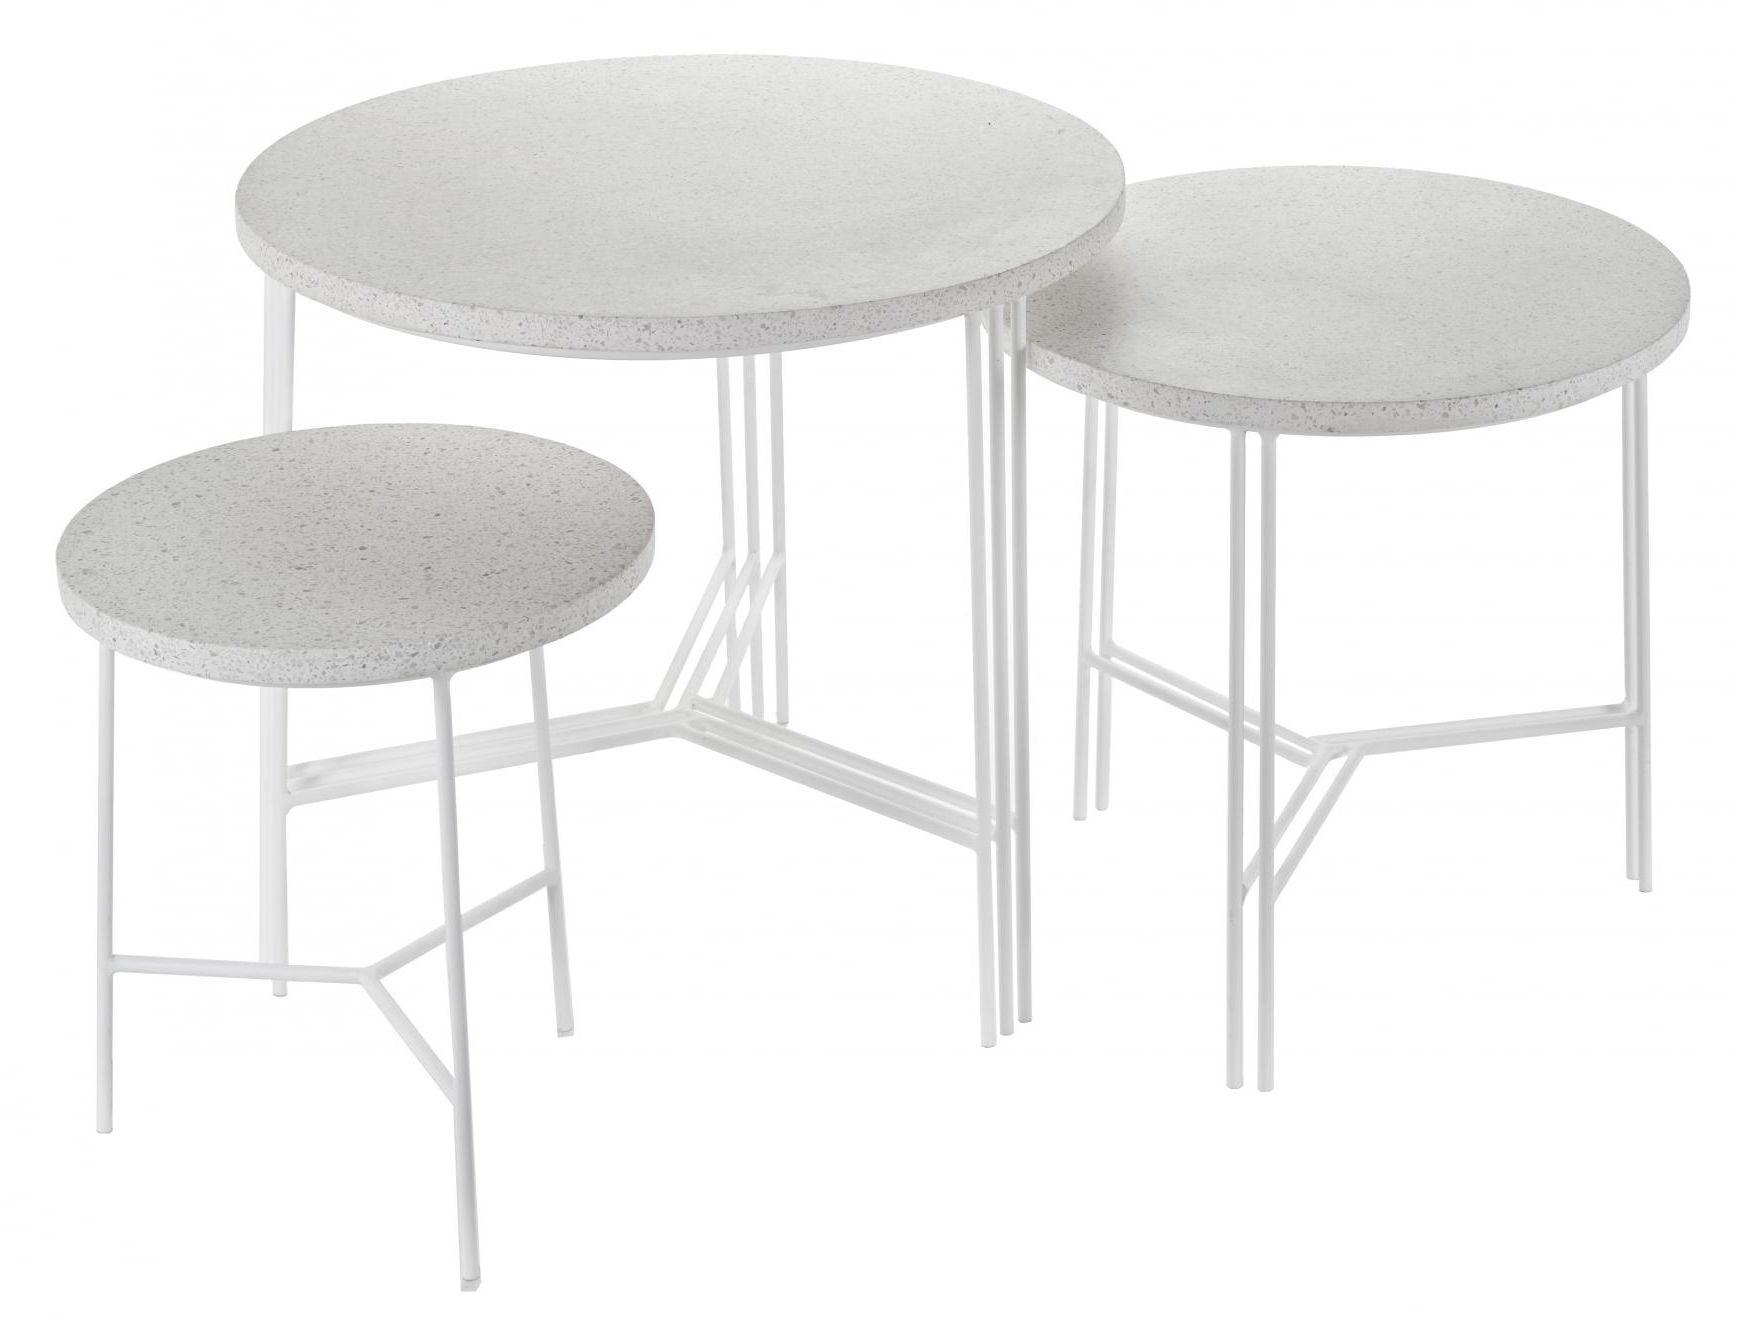 table basse terrazzo 40 x h 40 cm terrazzo blanc pied blanc serax. Black Bedroom Furniture Sets. Home Design Ideas